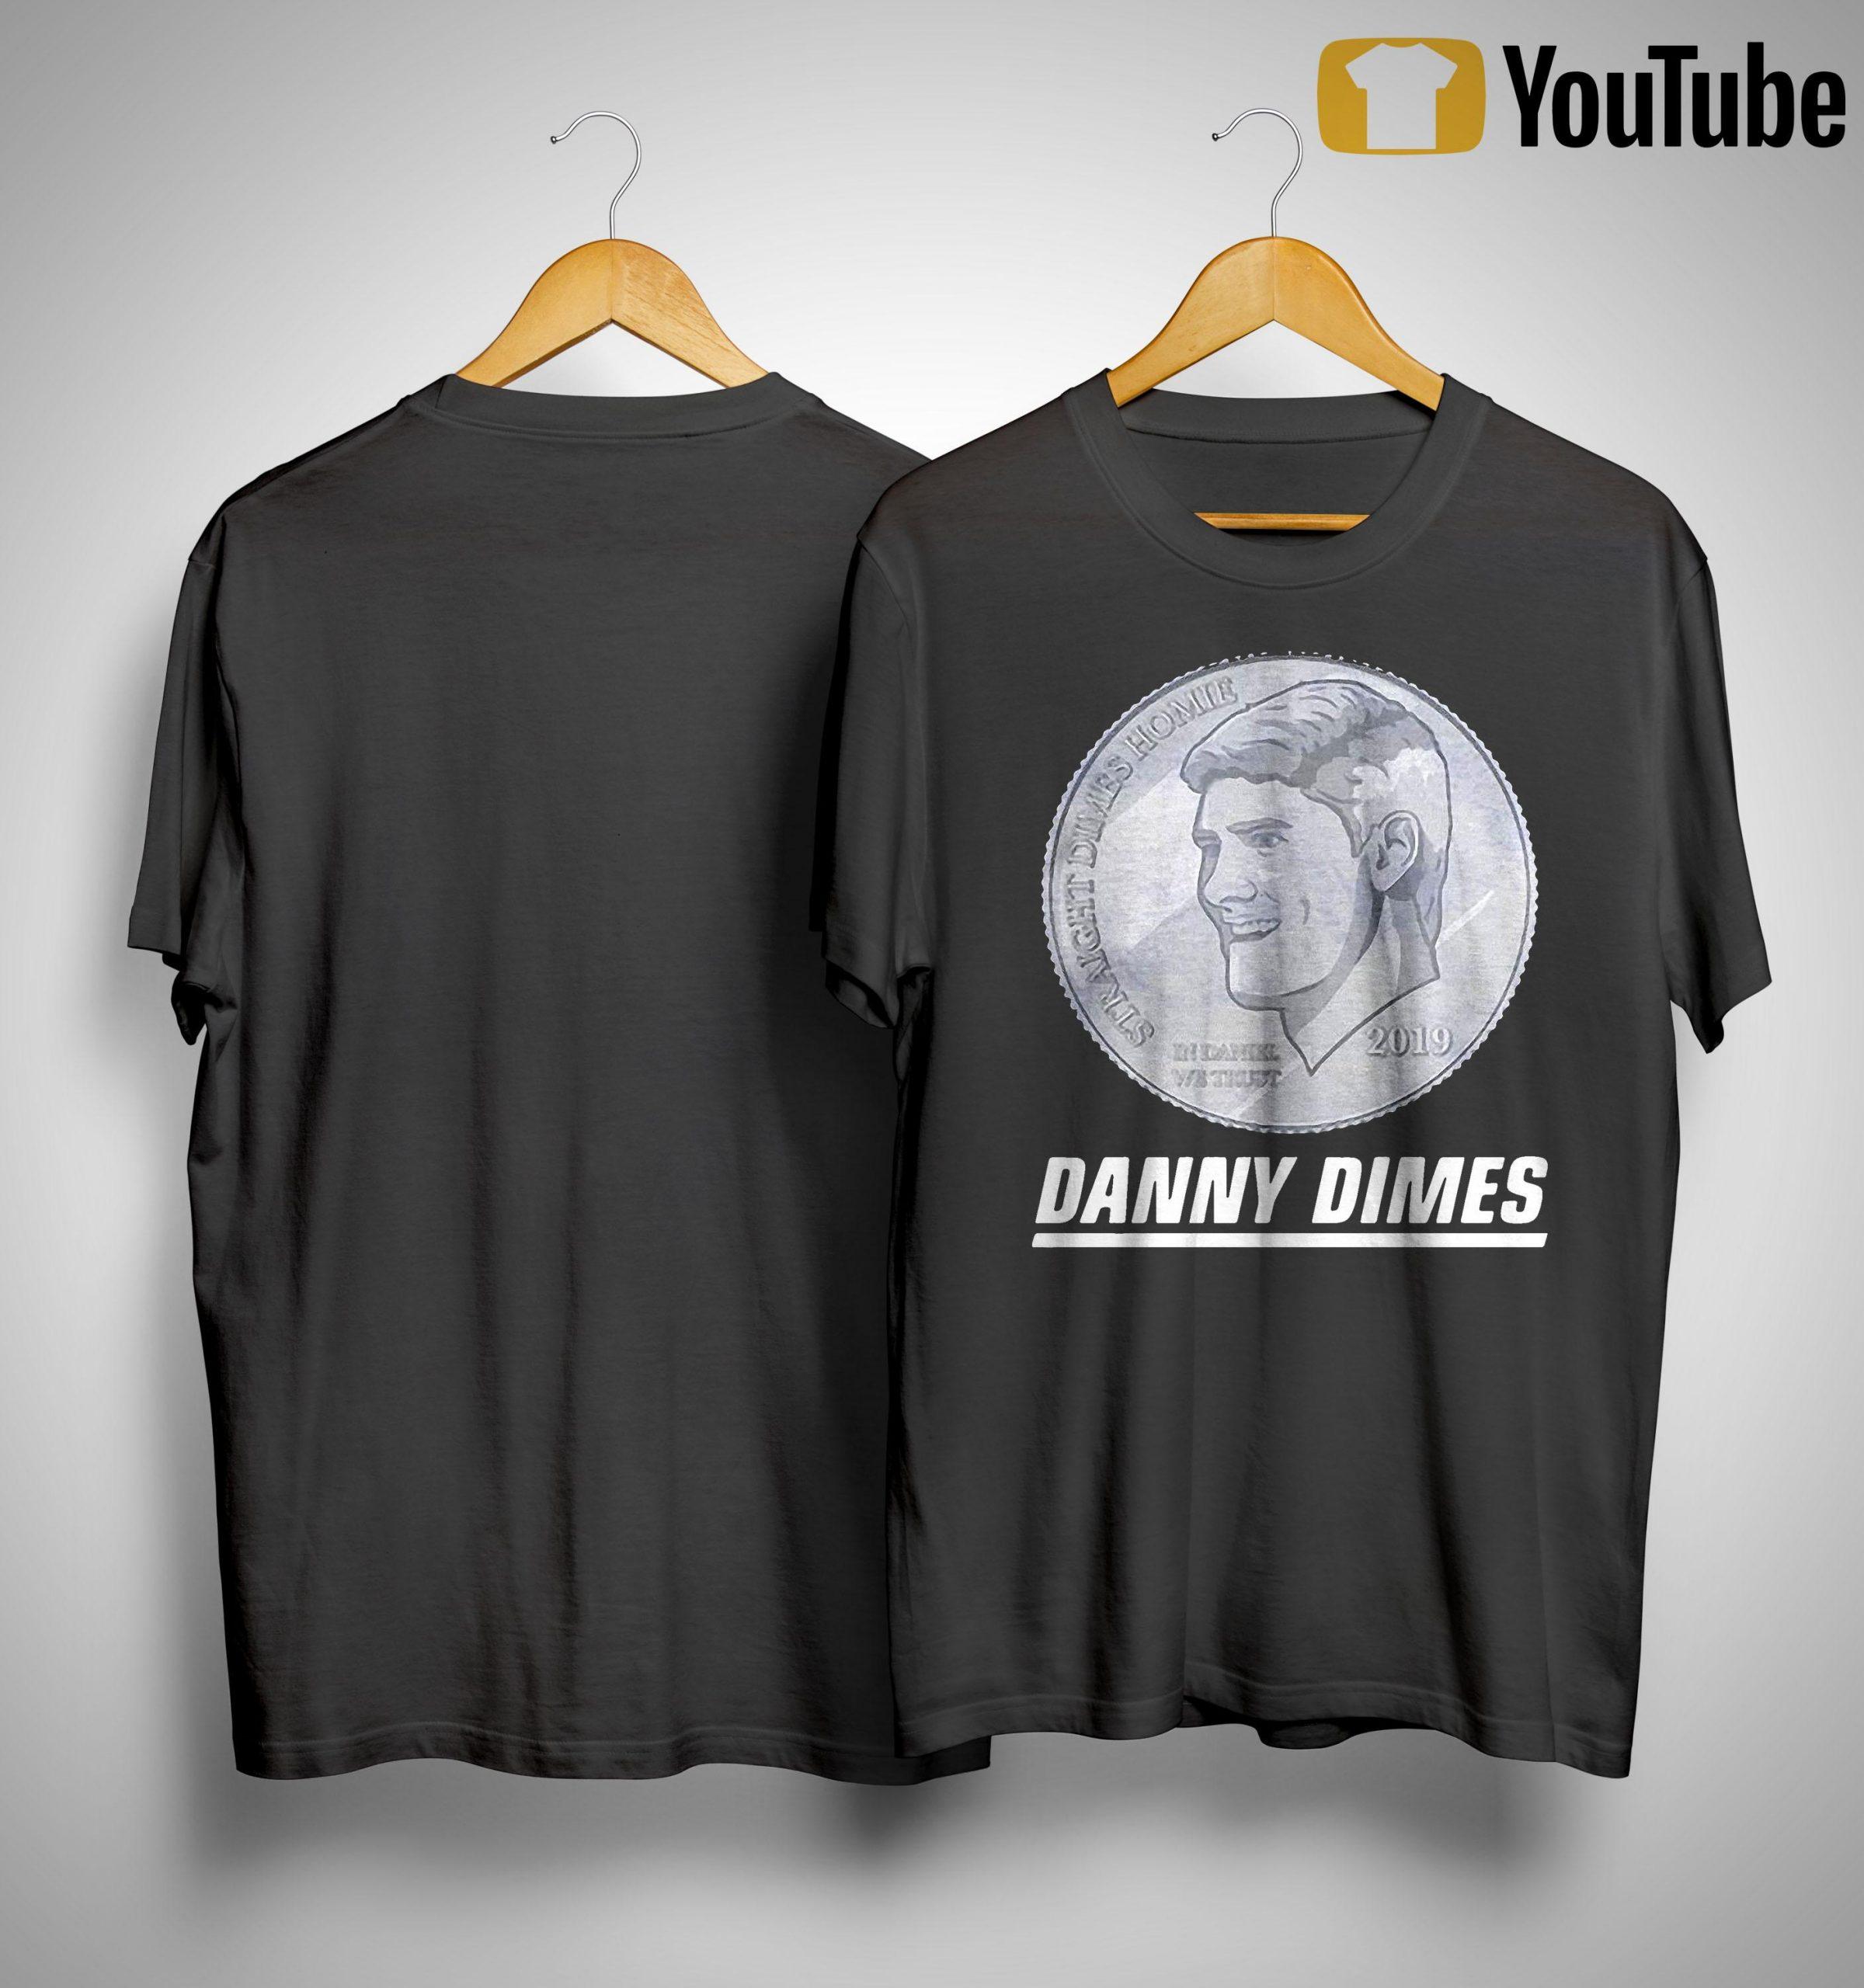 Danny Dimes Shirt